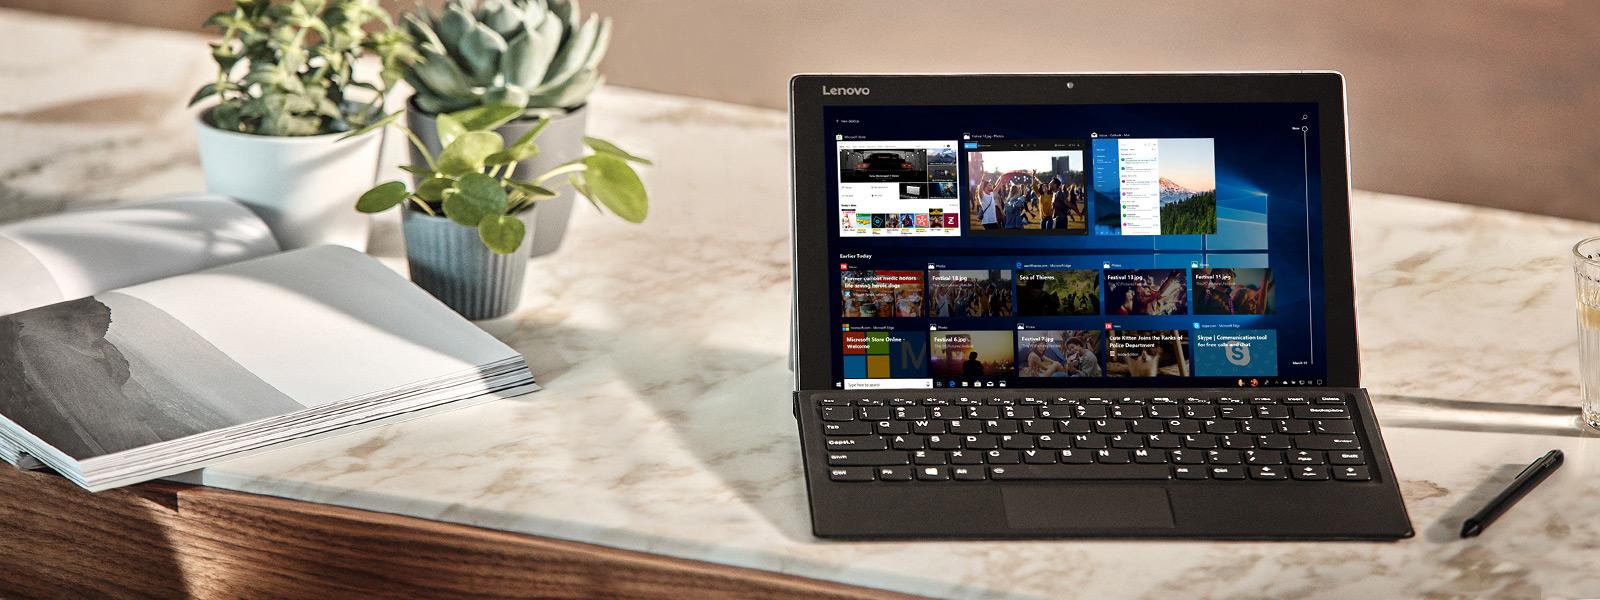 Windows 10 2018년 4월 업데이트의 기능이 표시된 컴퓨터 화면